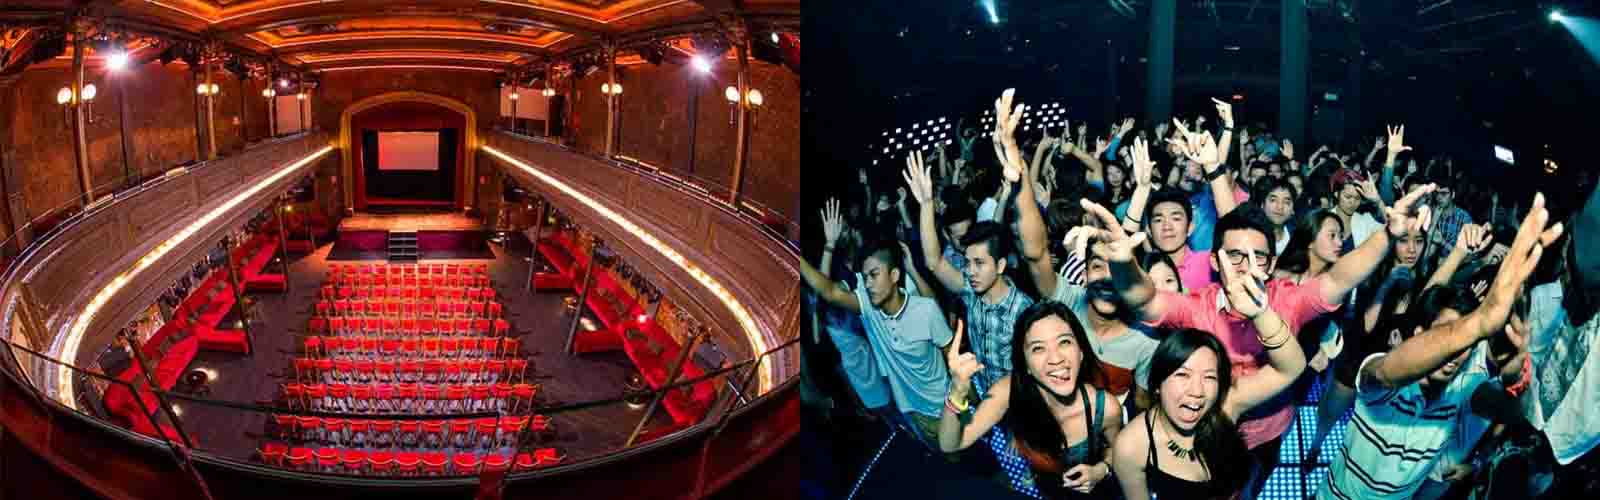 Dance in this mysterious nightclub Sala B